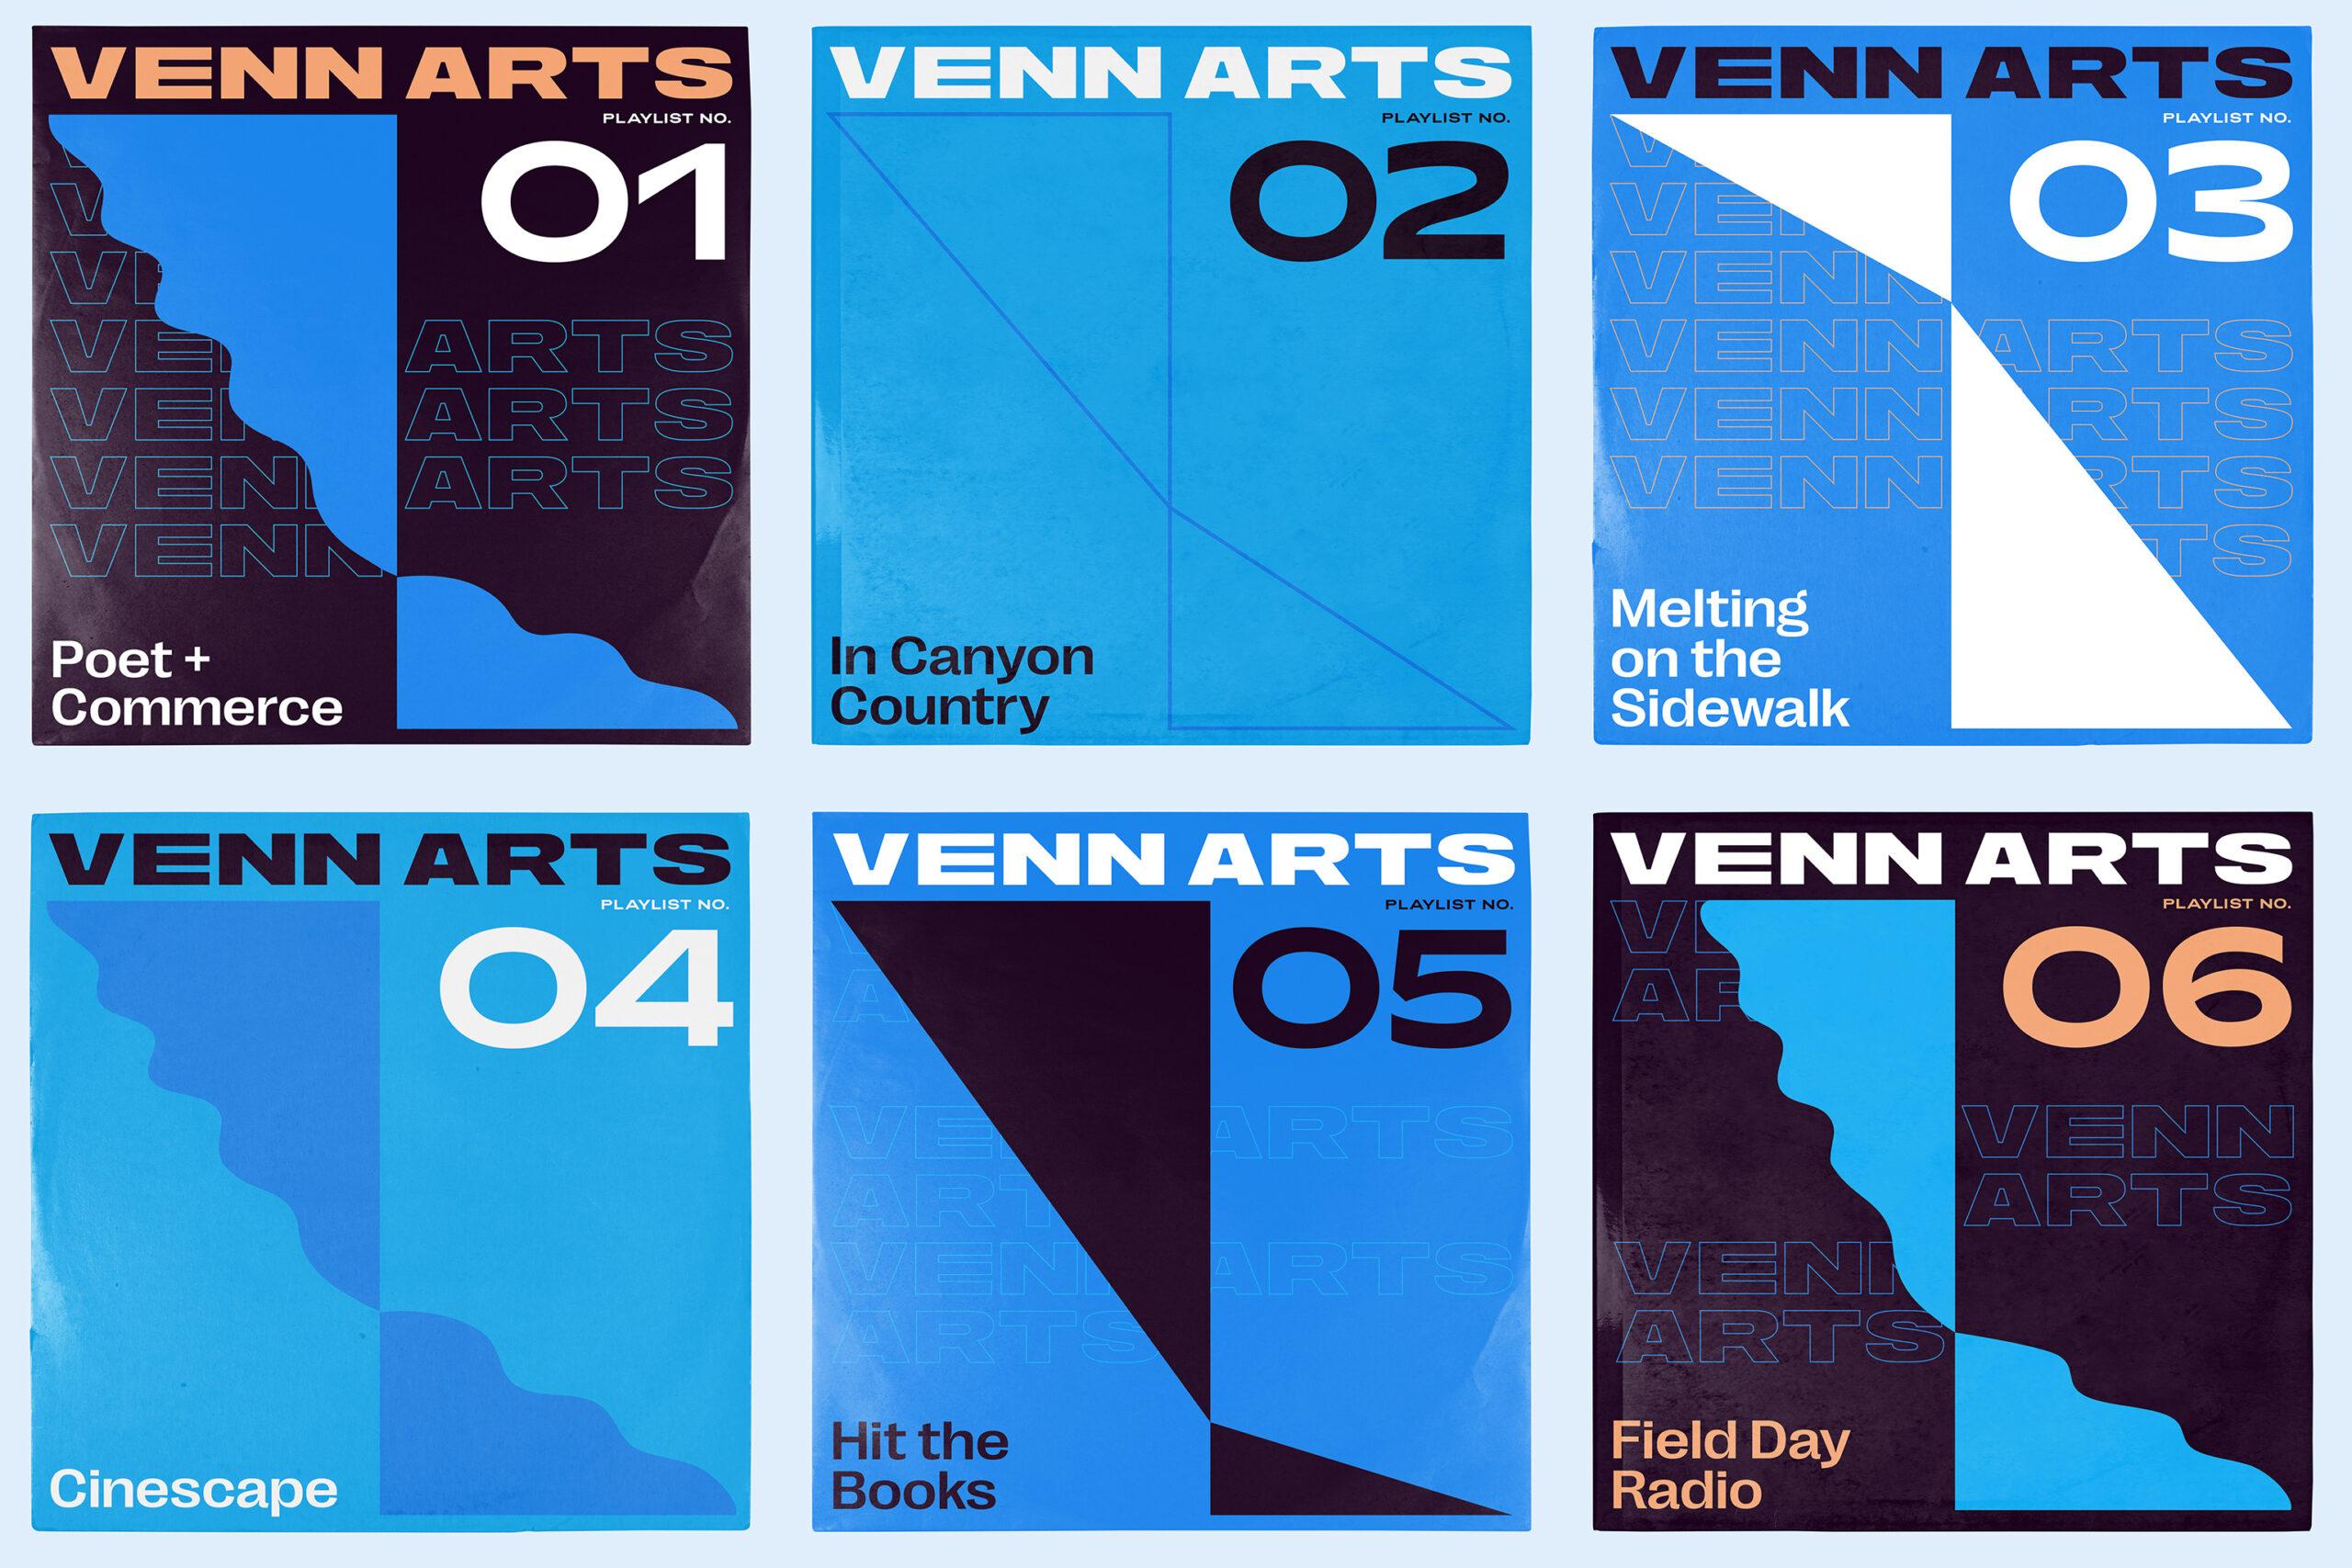 VennArts_Playlists_Cover1